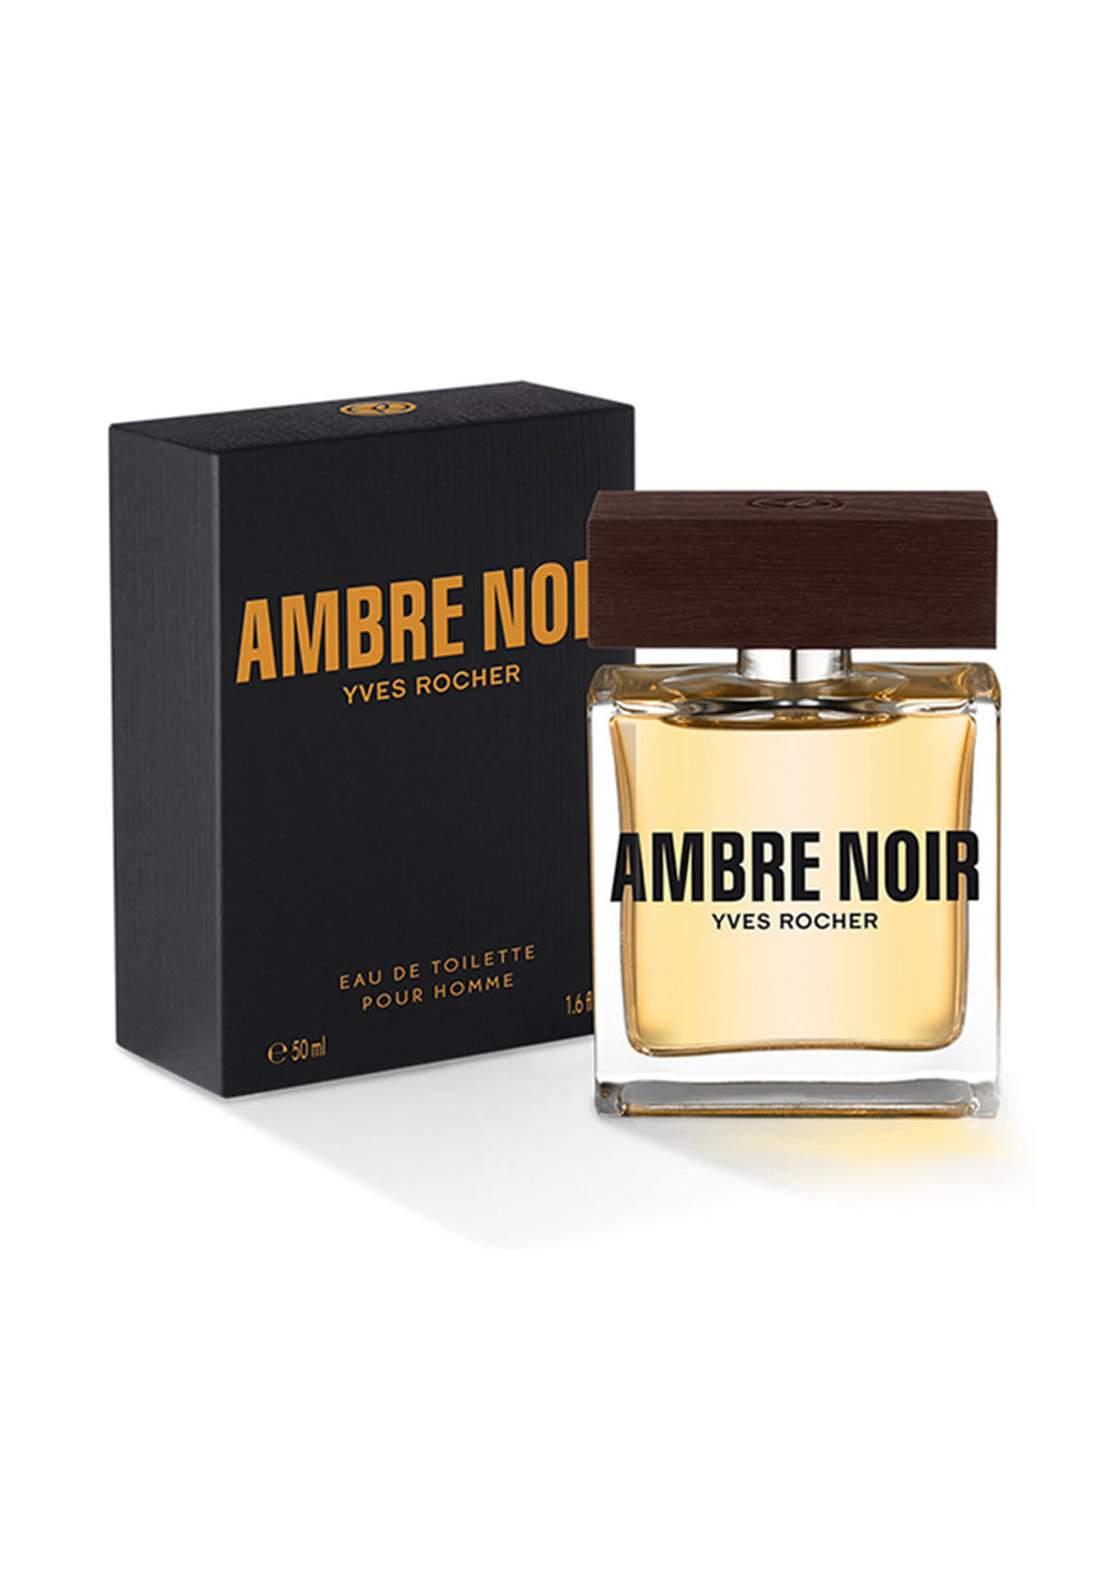 87375 Yves Rocher Ambre Noir Men Perfume 50ml عطر رجالي